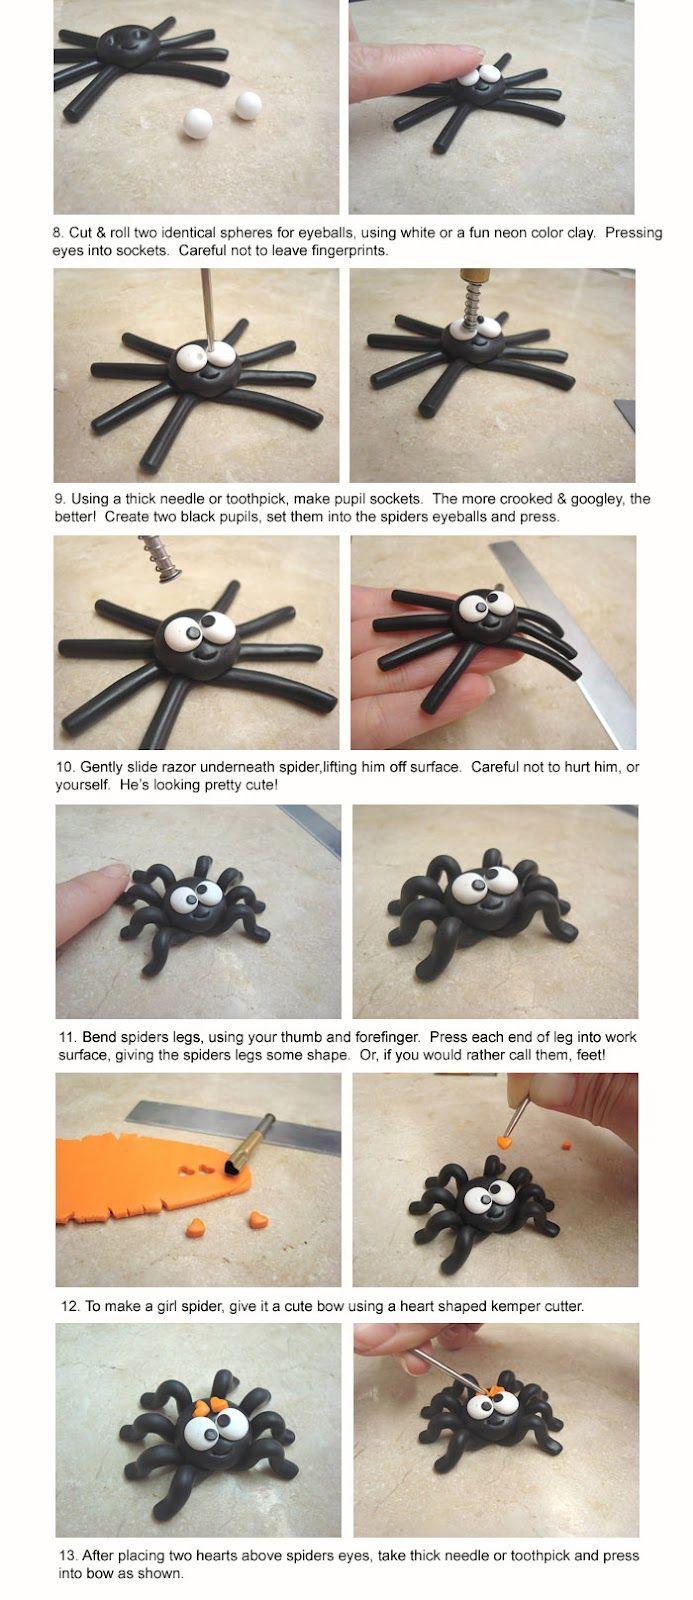 Creme de la Gems: Silly Spider Polymer Clay Tutorial DIY